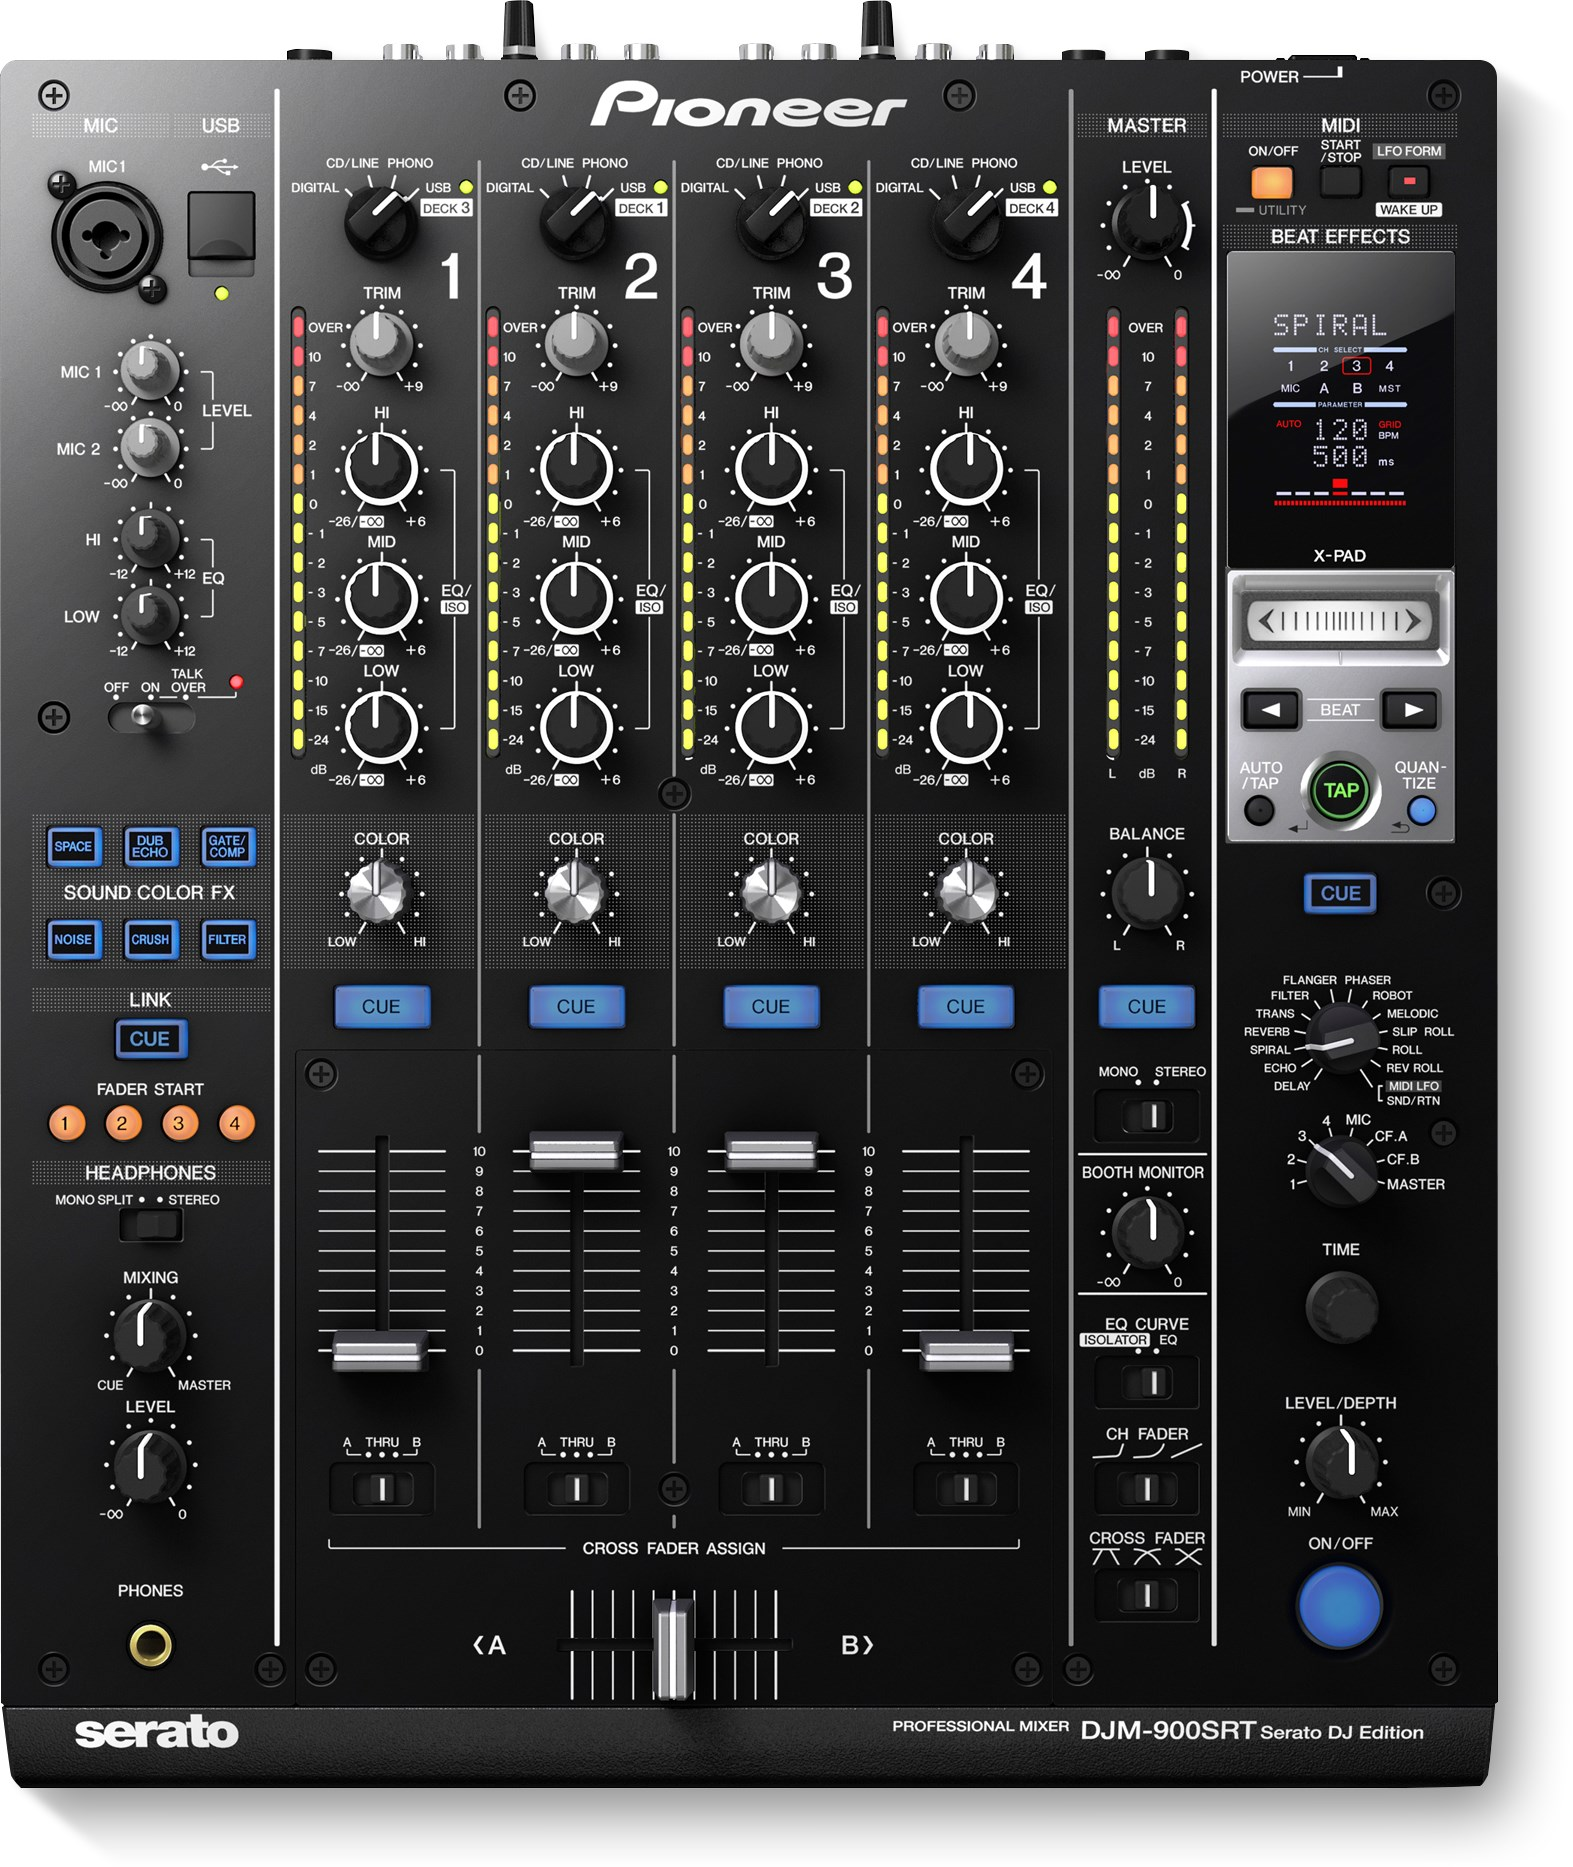 DJM-900SRT